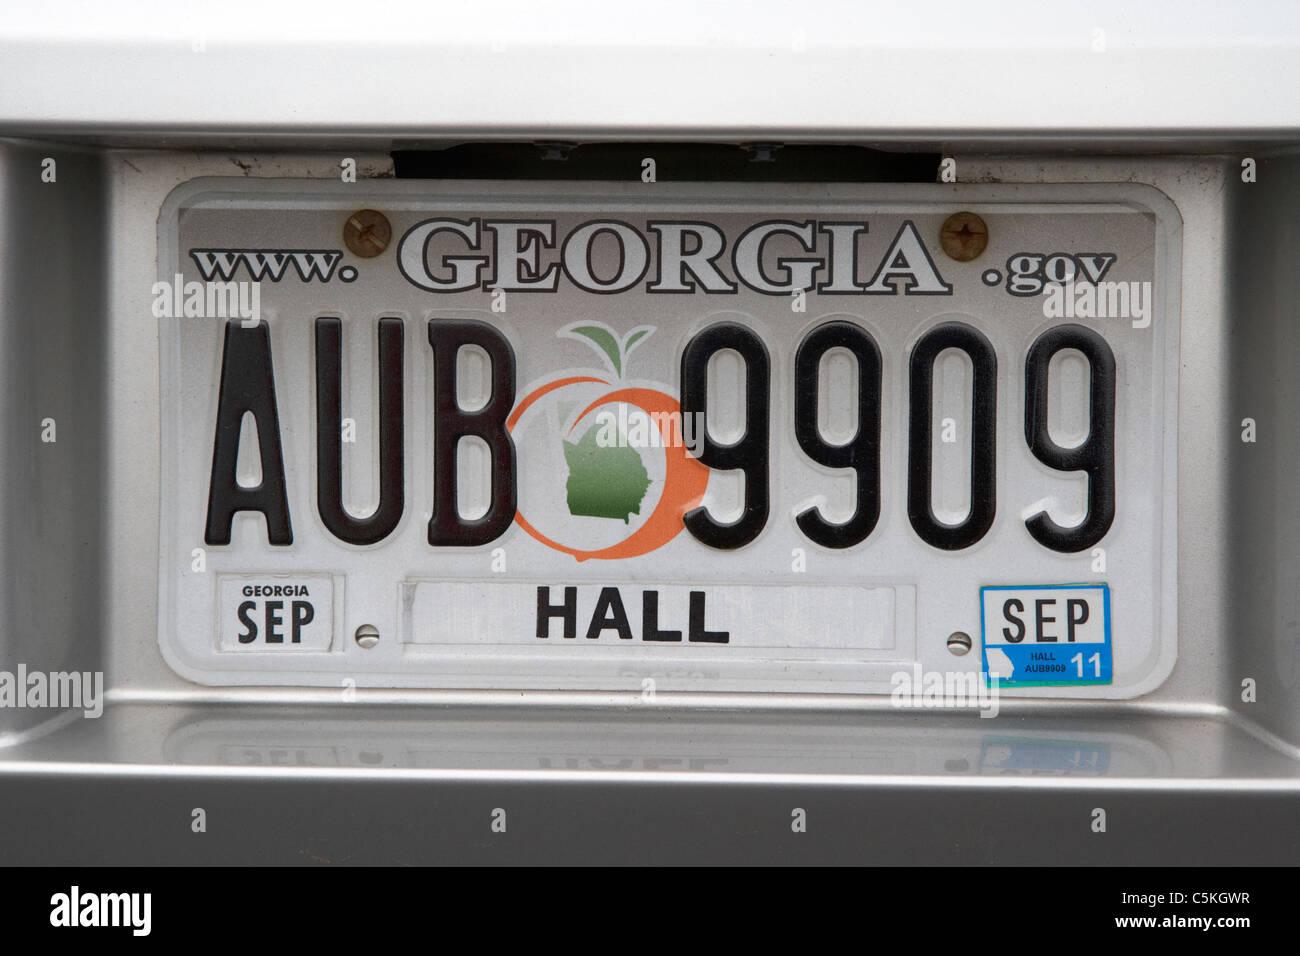 Us Car Number Plate Stockfotos & Us Car Number Plate Bilder - Alamy